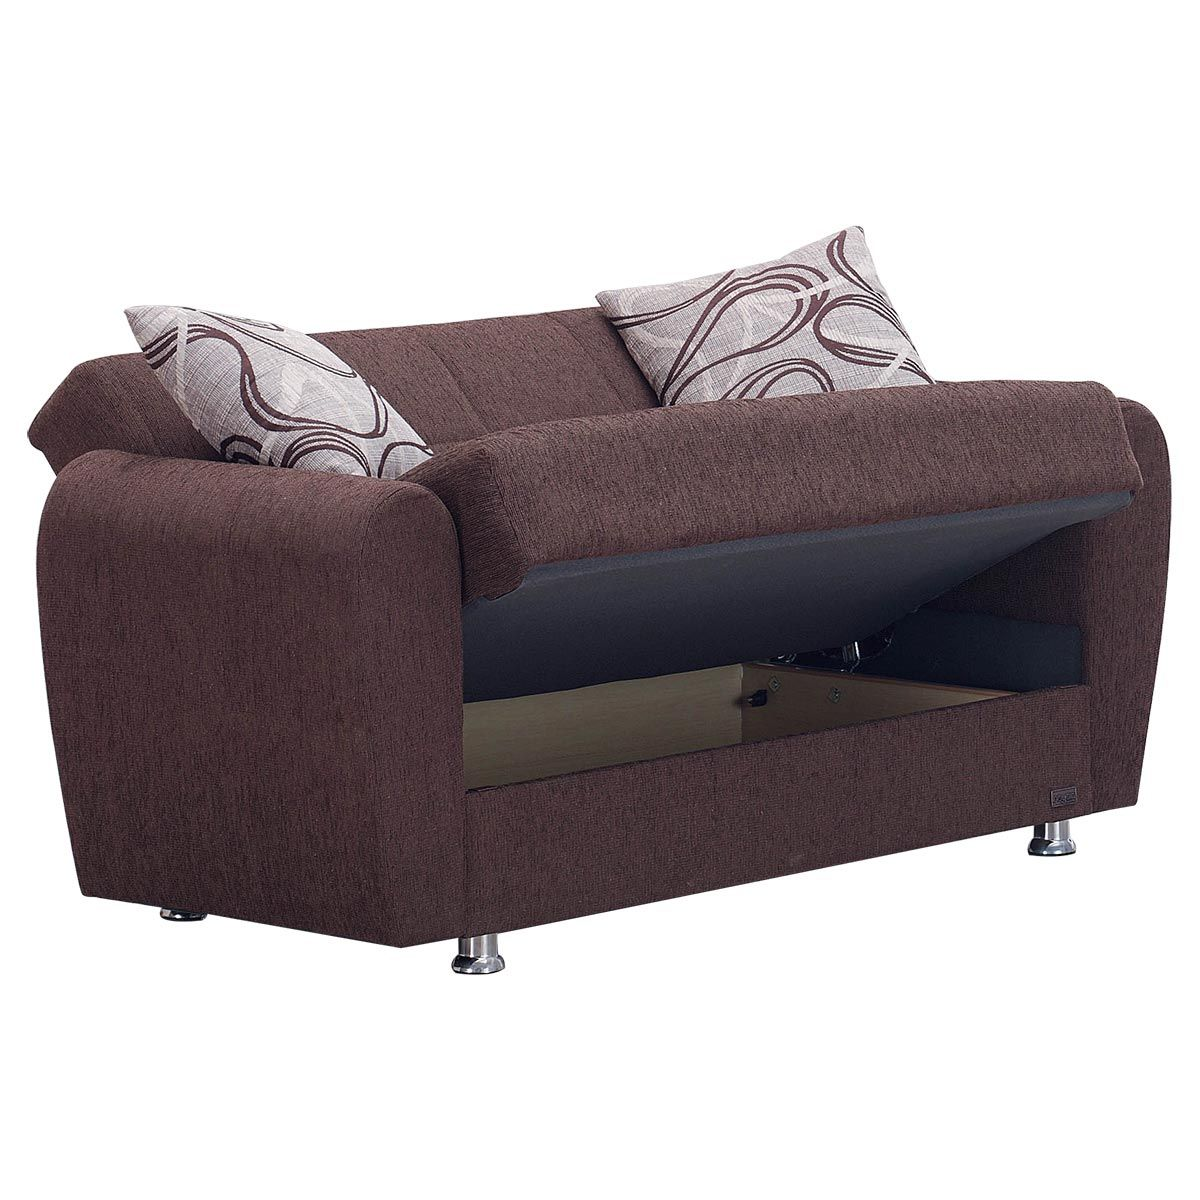 Boston Sofa Bed Sofa bed furniture, Sofa bed, Sofa